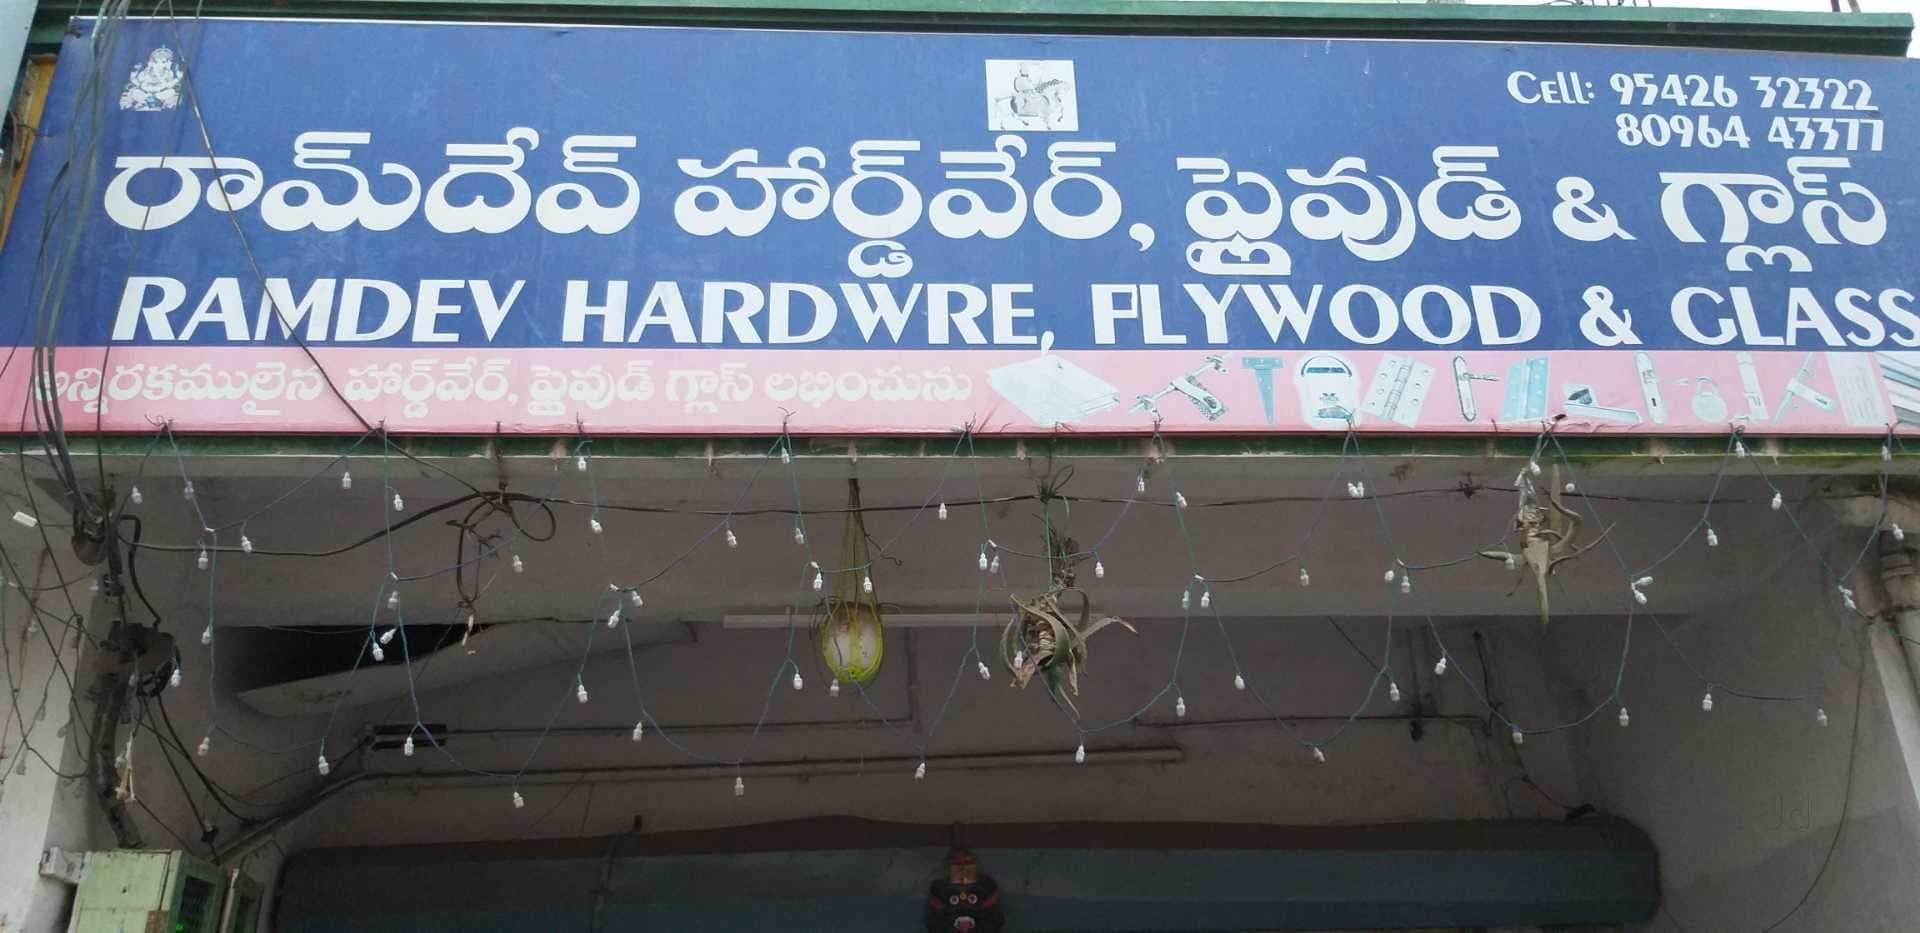 Top 50 Hardware Dealers in Rotary Nagar, Khammam - Best